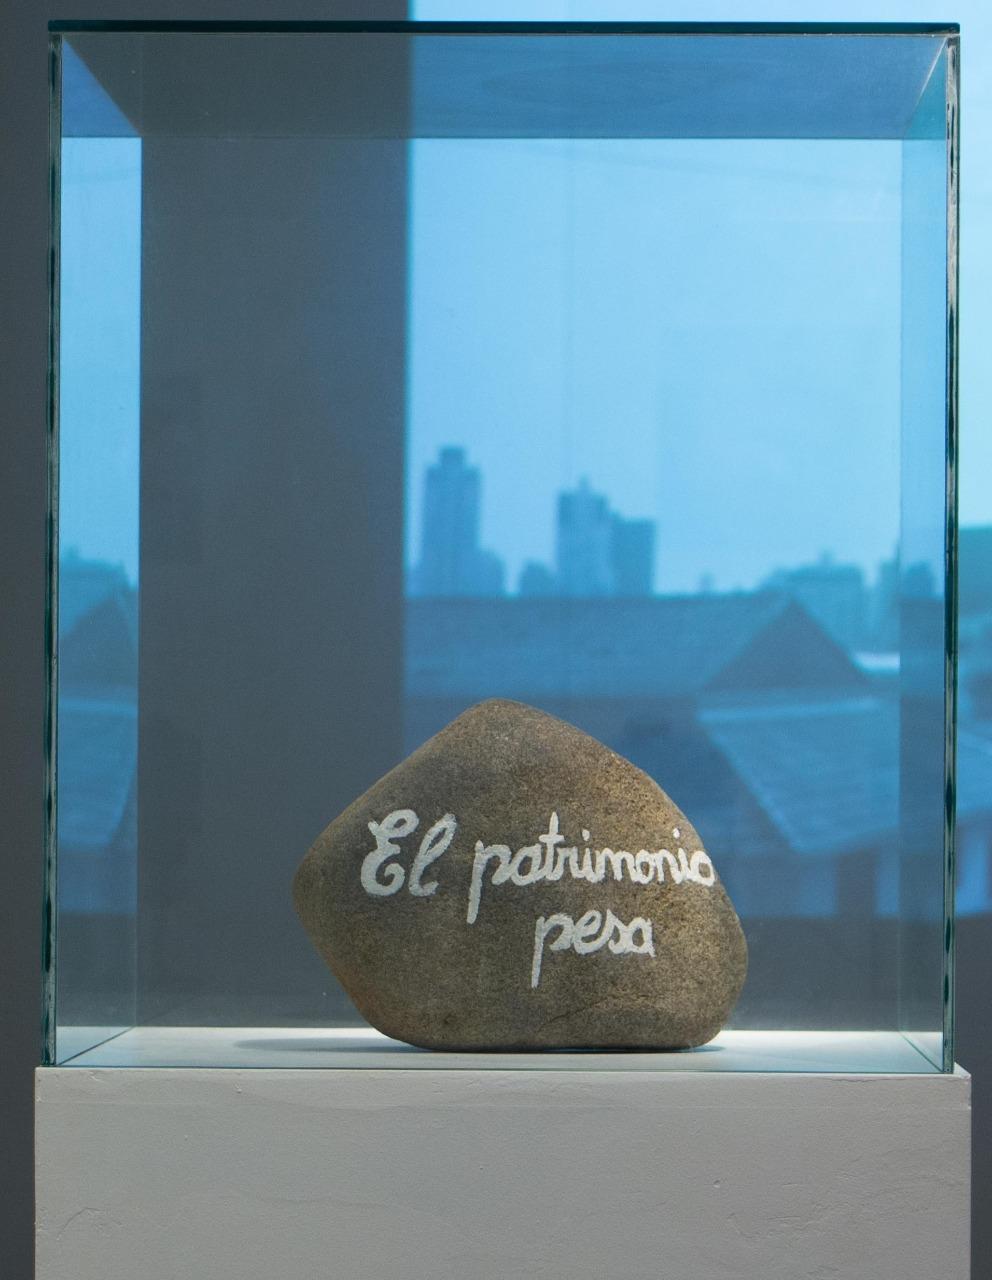 El patrimonio pesa, Perla Ramos, 2017. Apropriação, 12.8 x 24 x 14 cm, pedra patrimonial pintada.